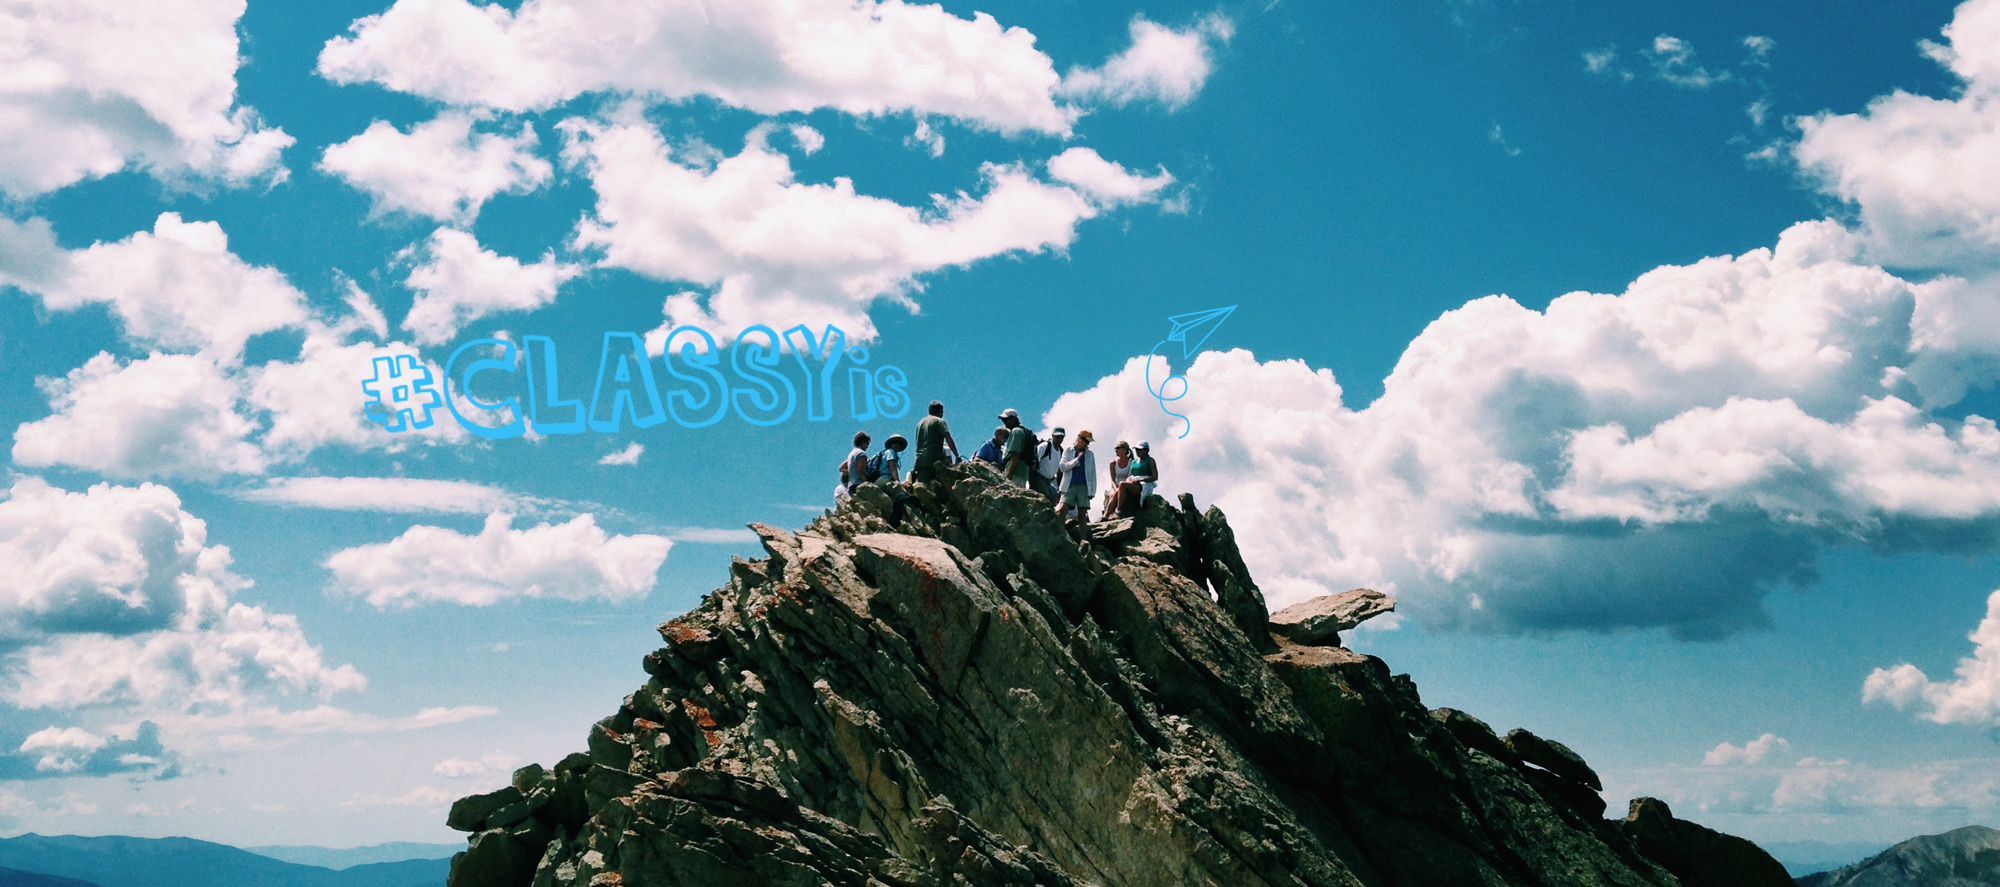 classyis-climbing-1